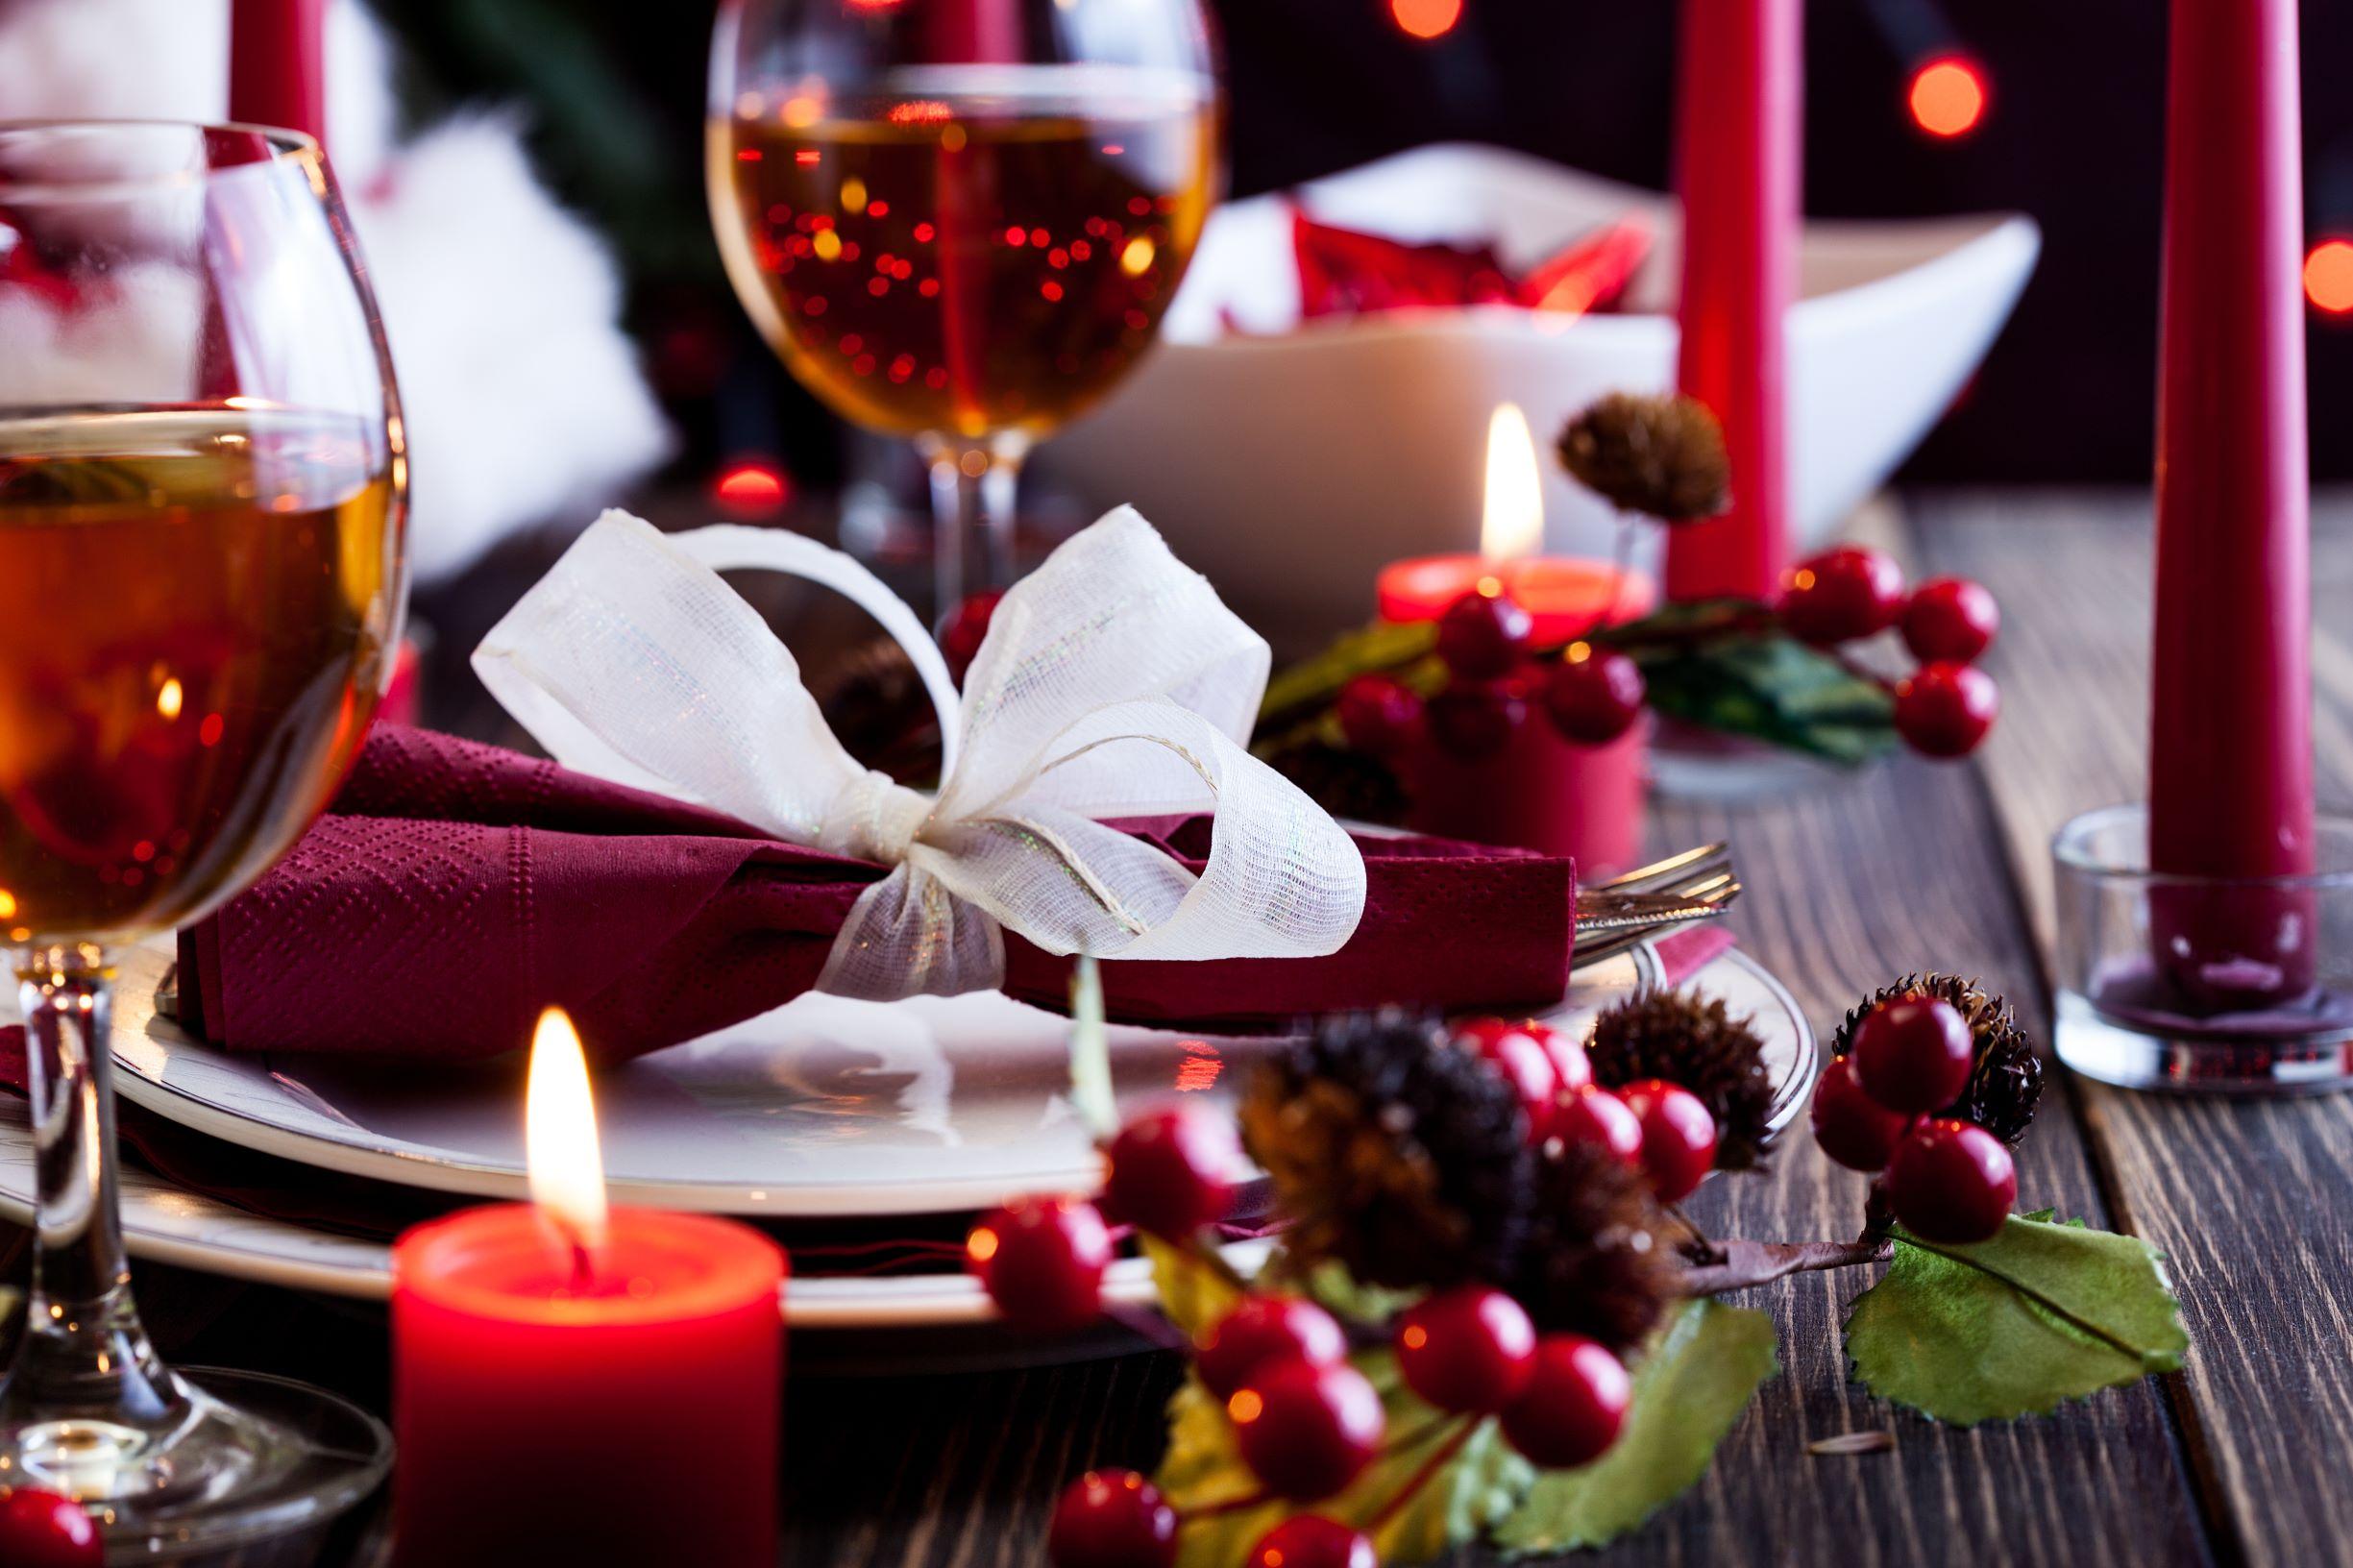 Restaurants That Are Open In Dayton Ohio Christmas Day 2020 Restaurants that are open on Christmas Day near Dayton